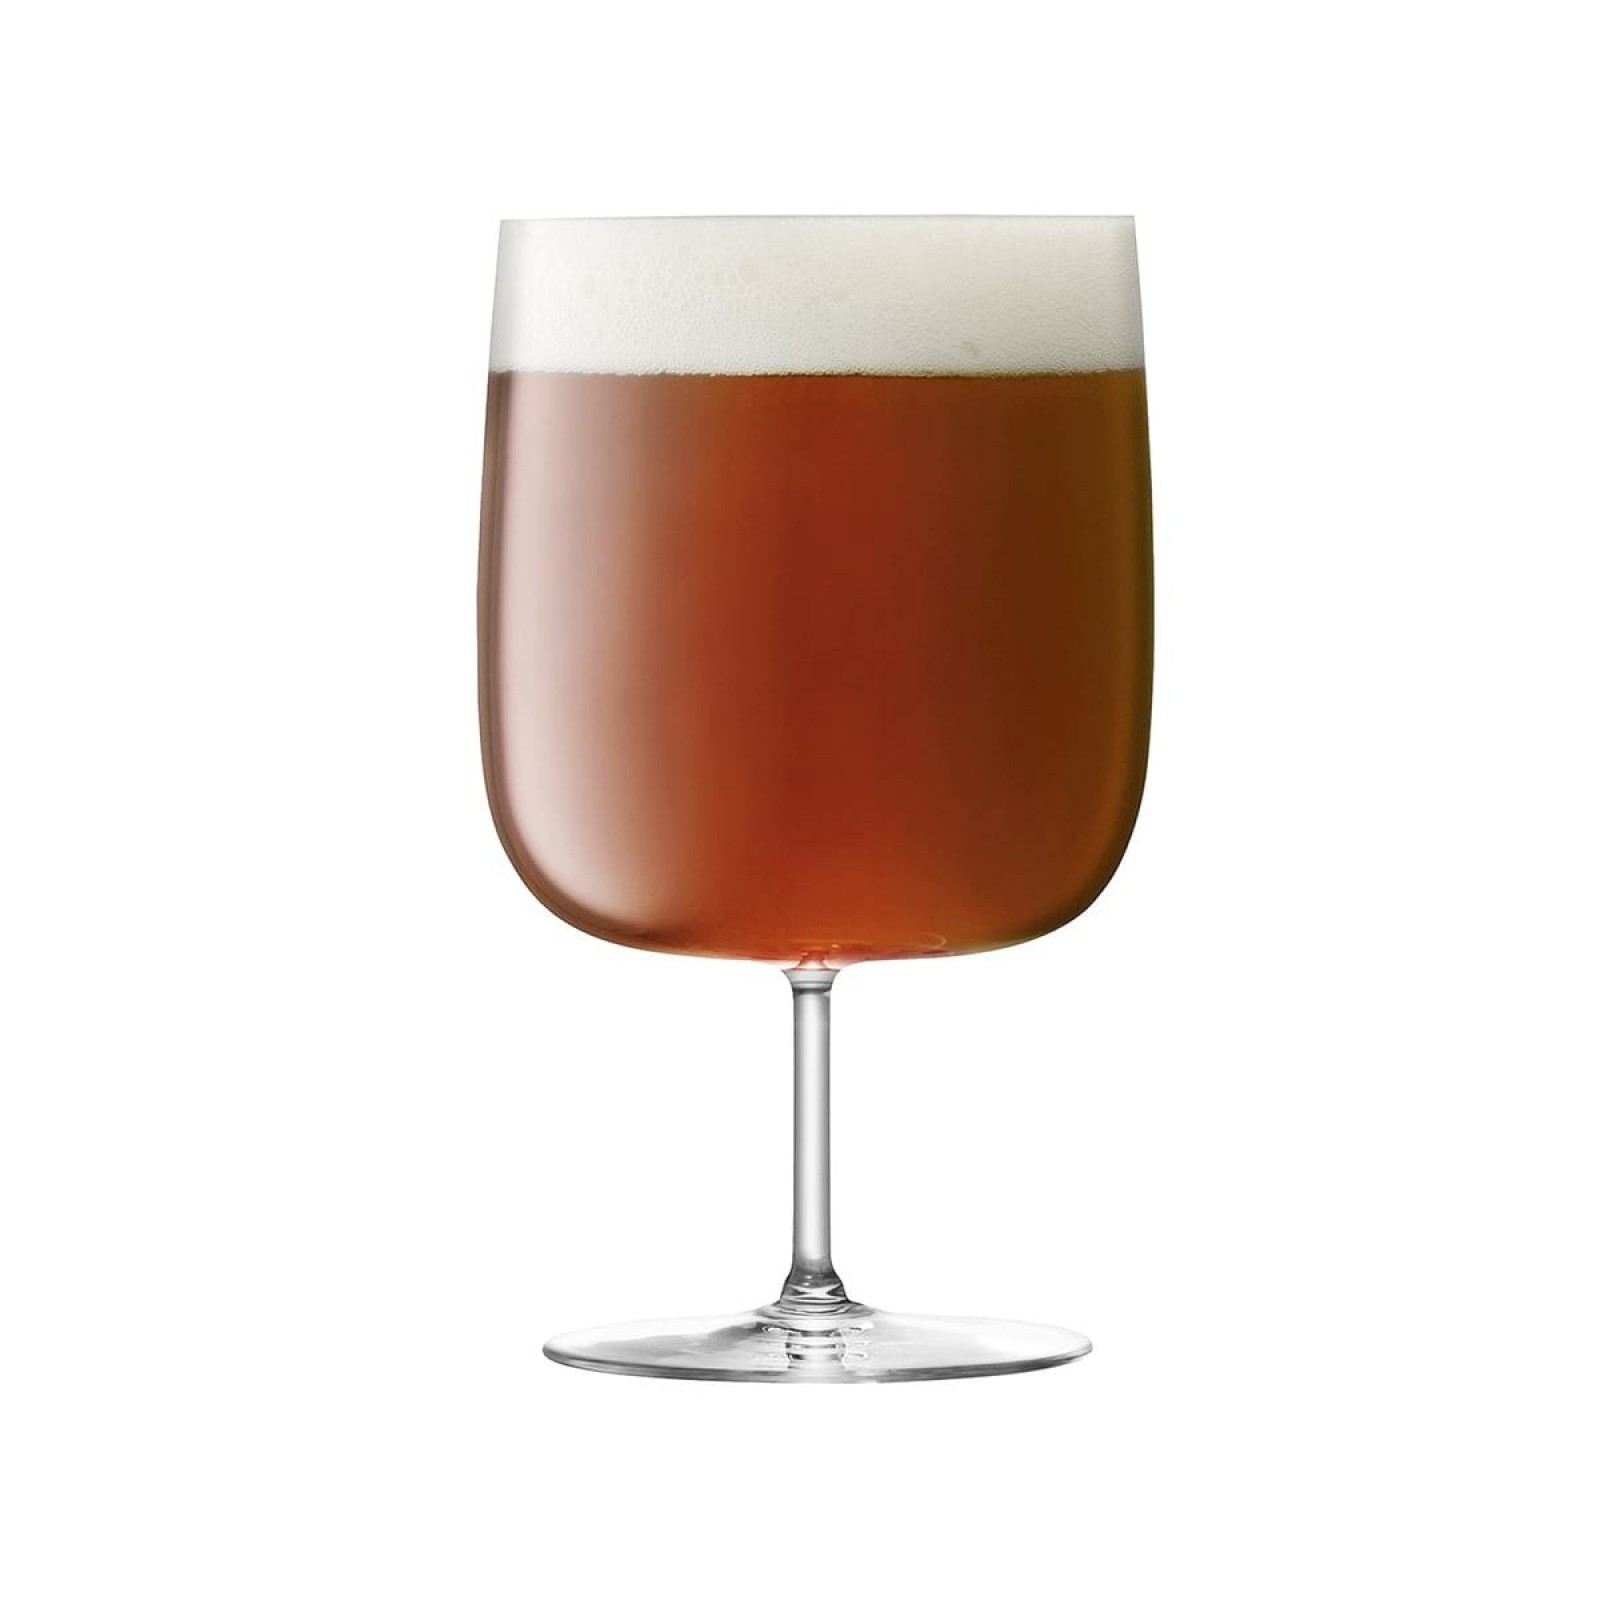 Borough Craft Beer Glasses 625 ml. (Set of 4) - LSA